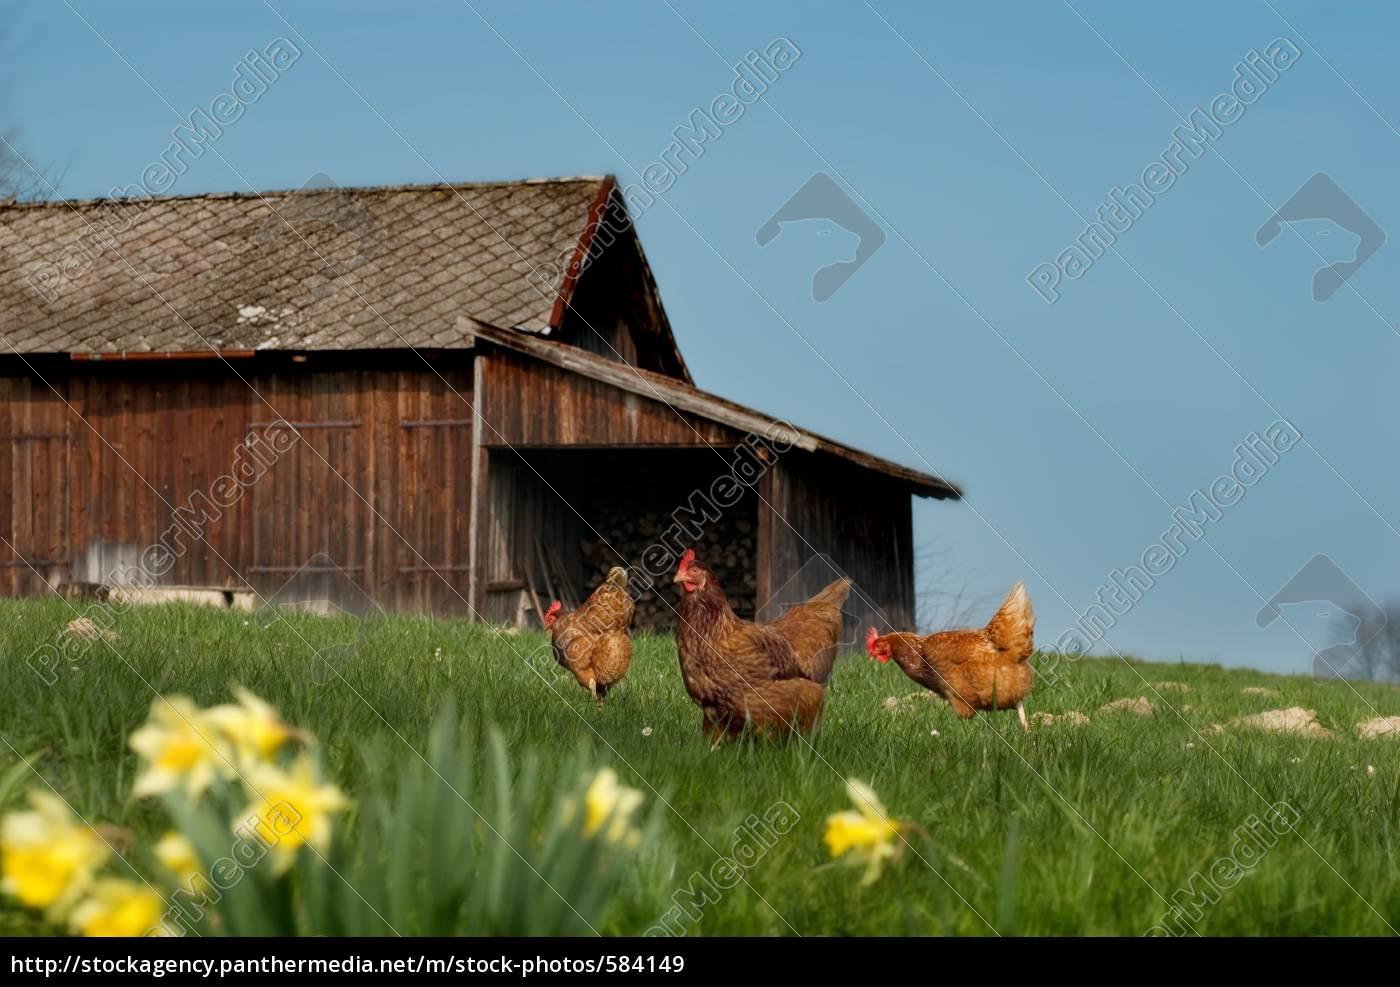 happy, chickens - 584149